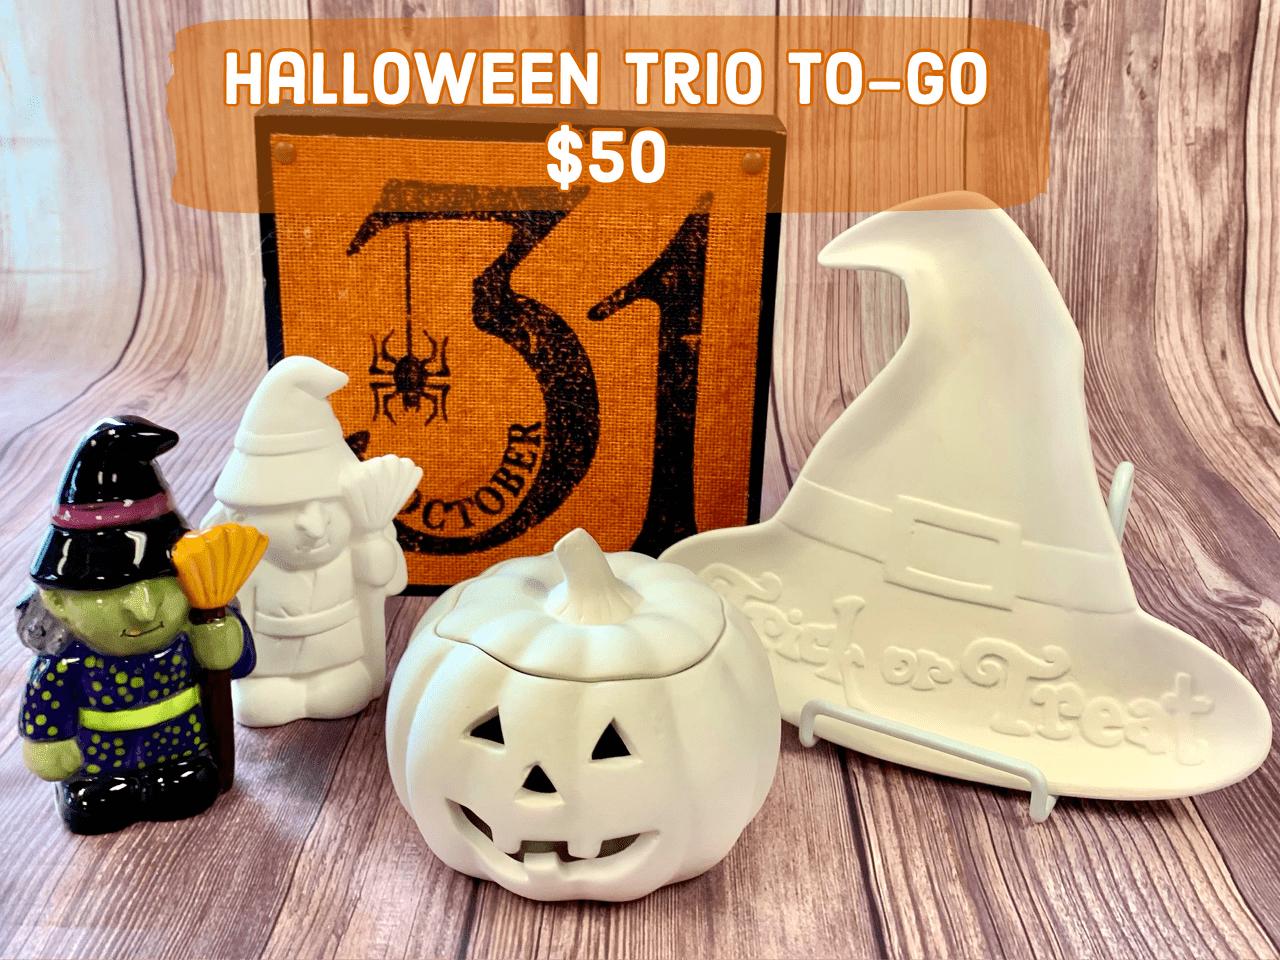 Halloween Trio To-Go $50